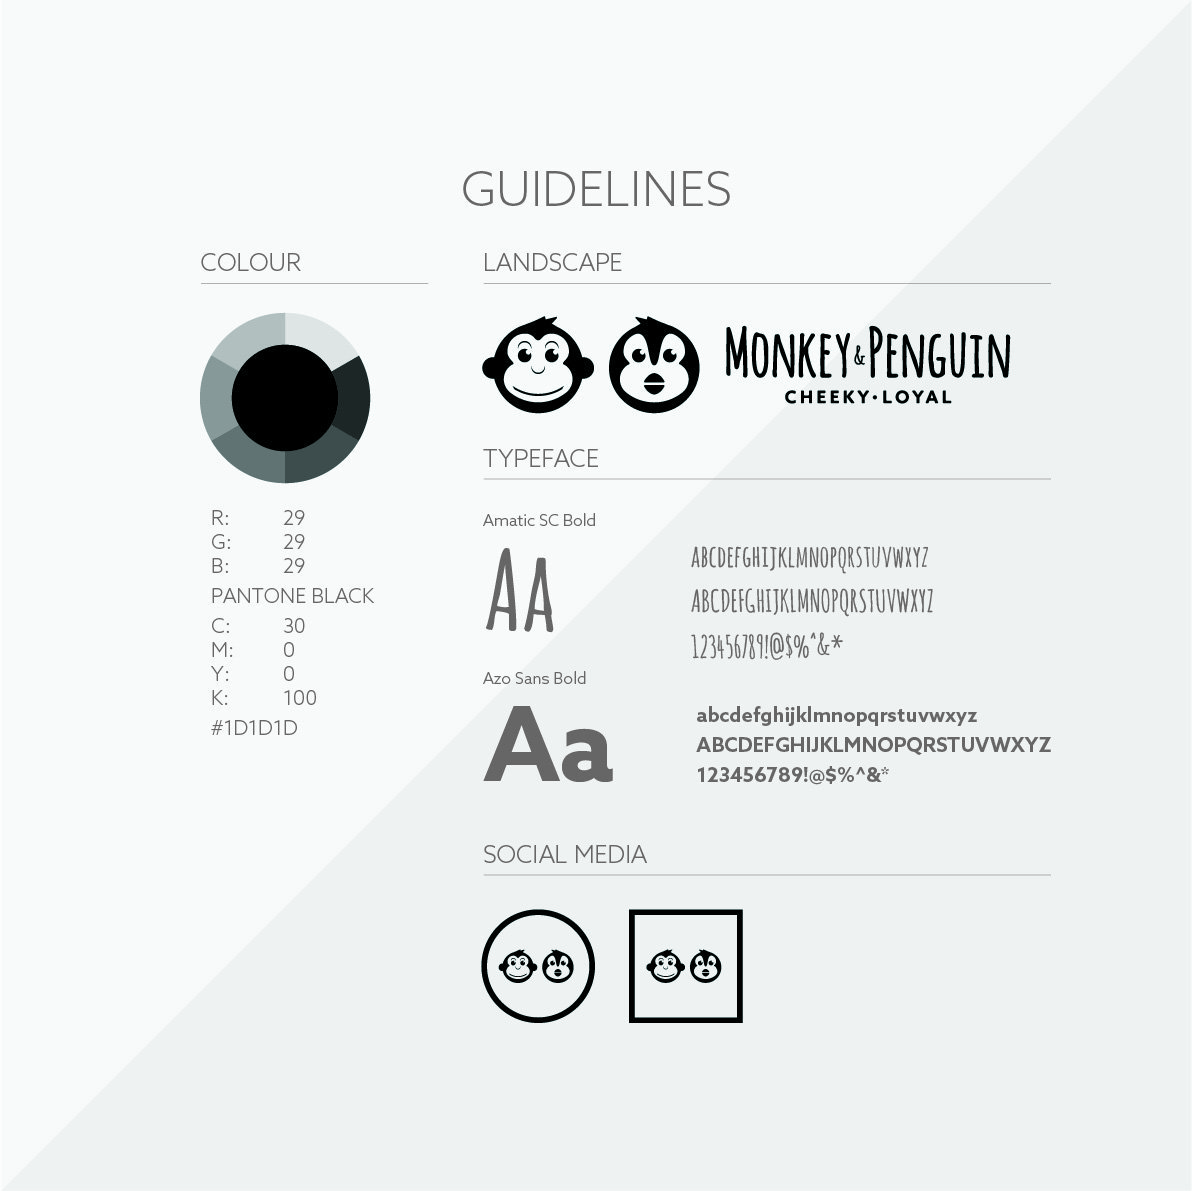 Monkey and Penguin Logo Guidelines